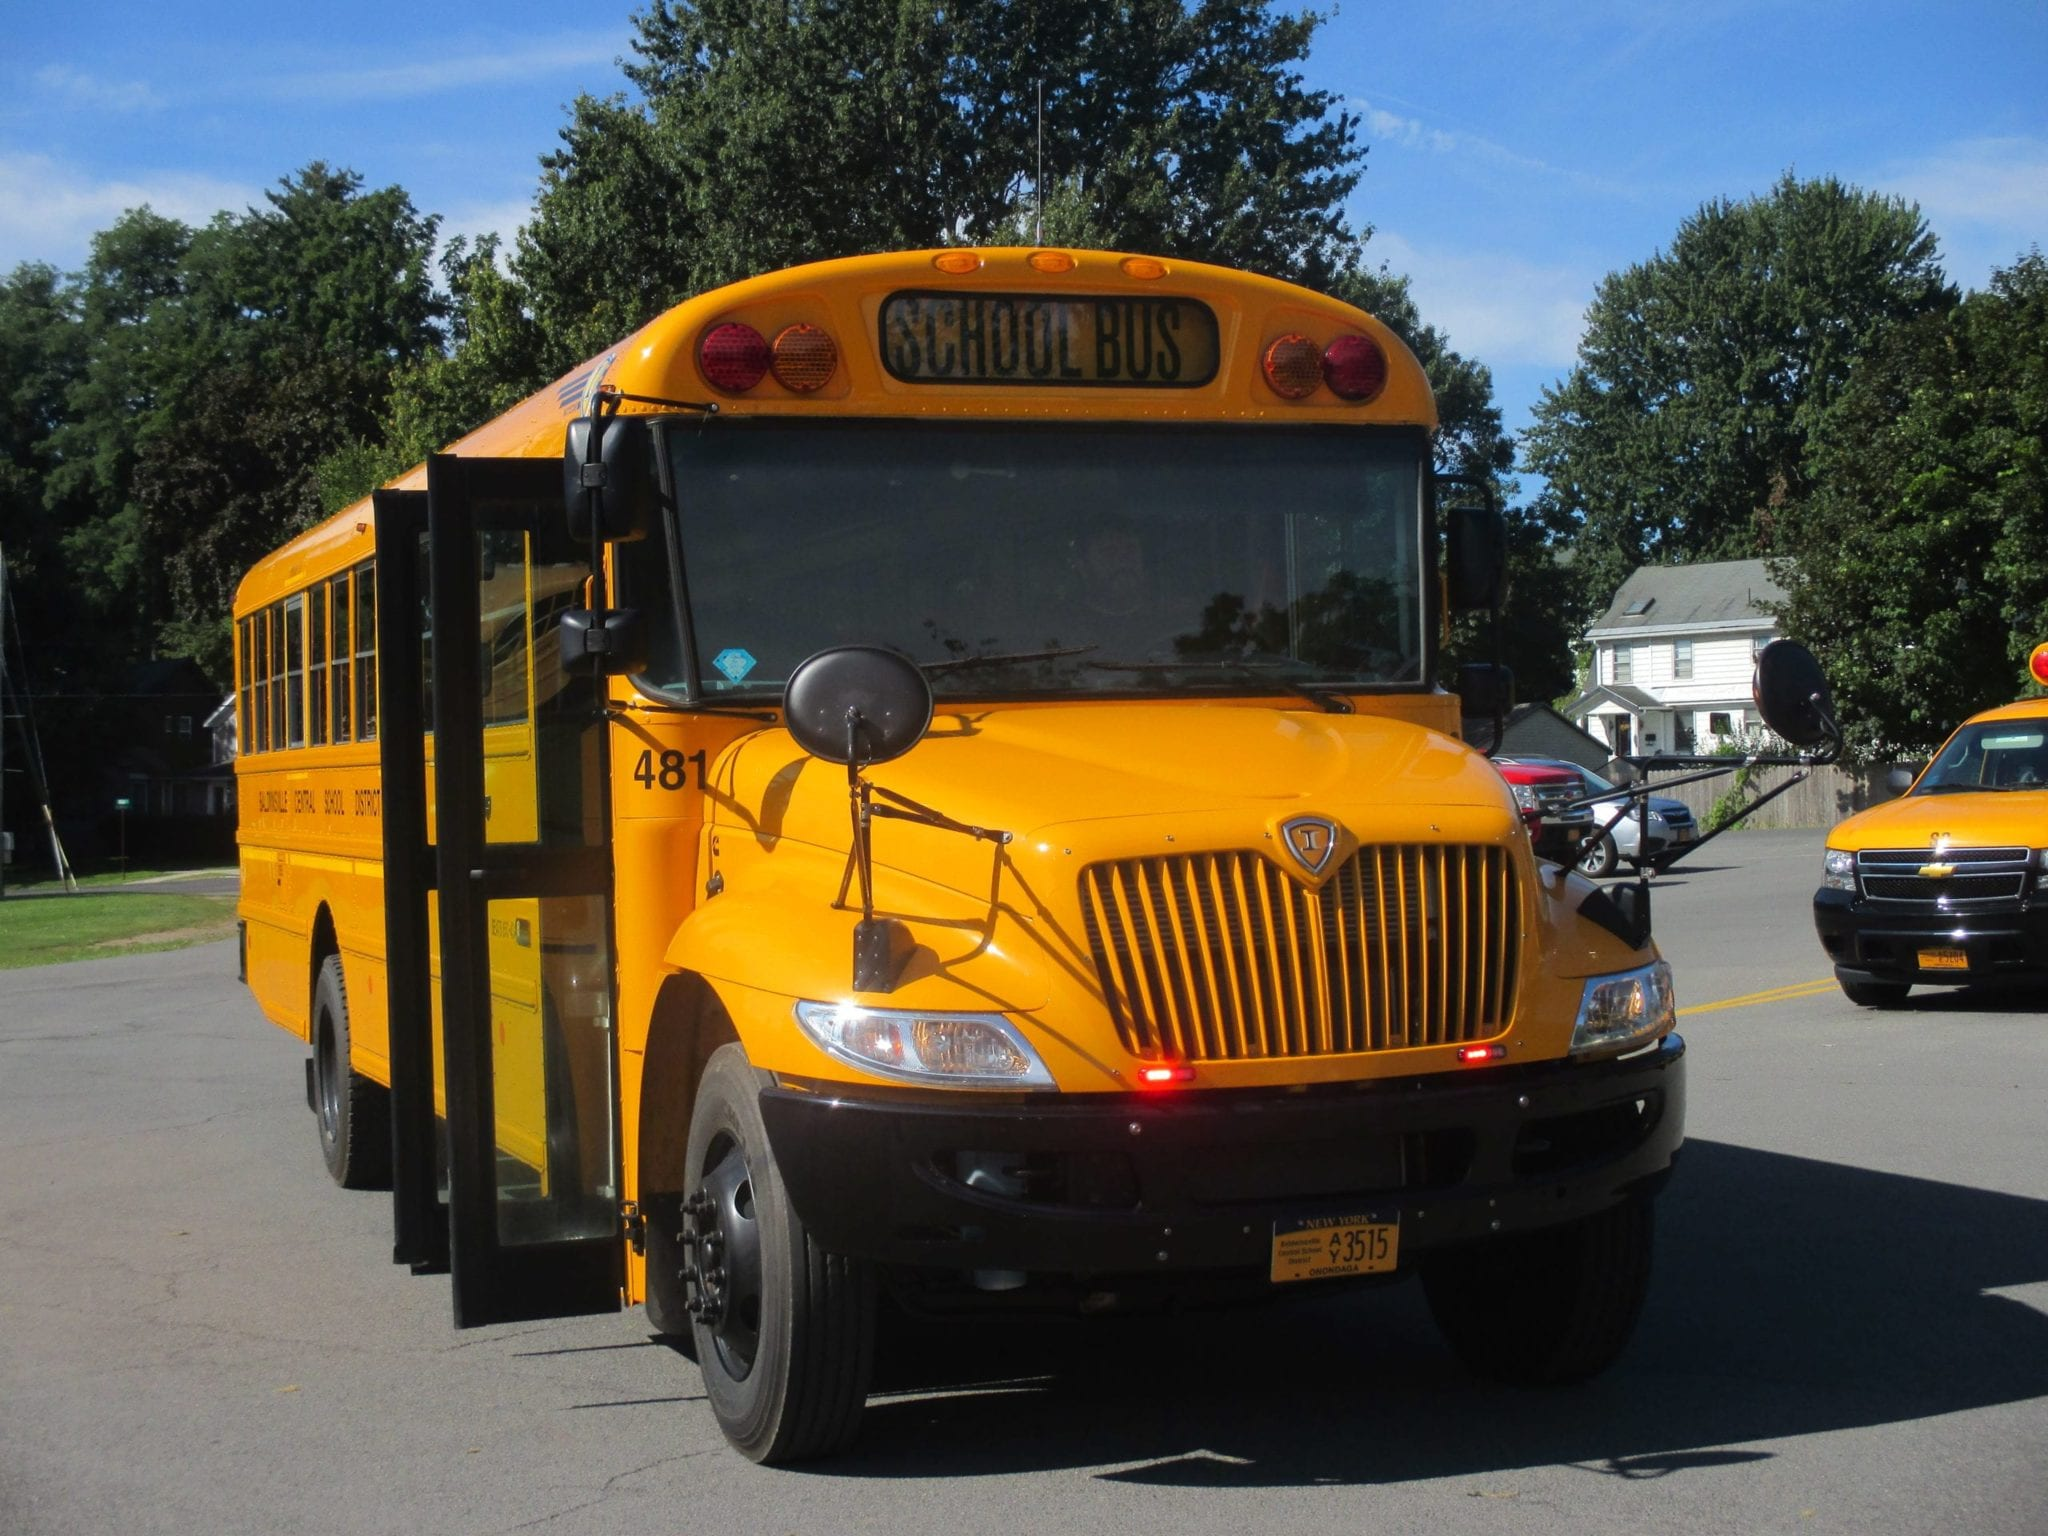 eagle news online back to school b ville buses add new warning lights